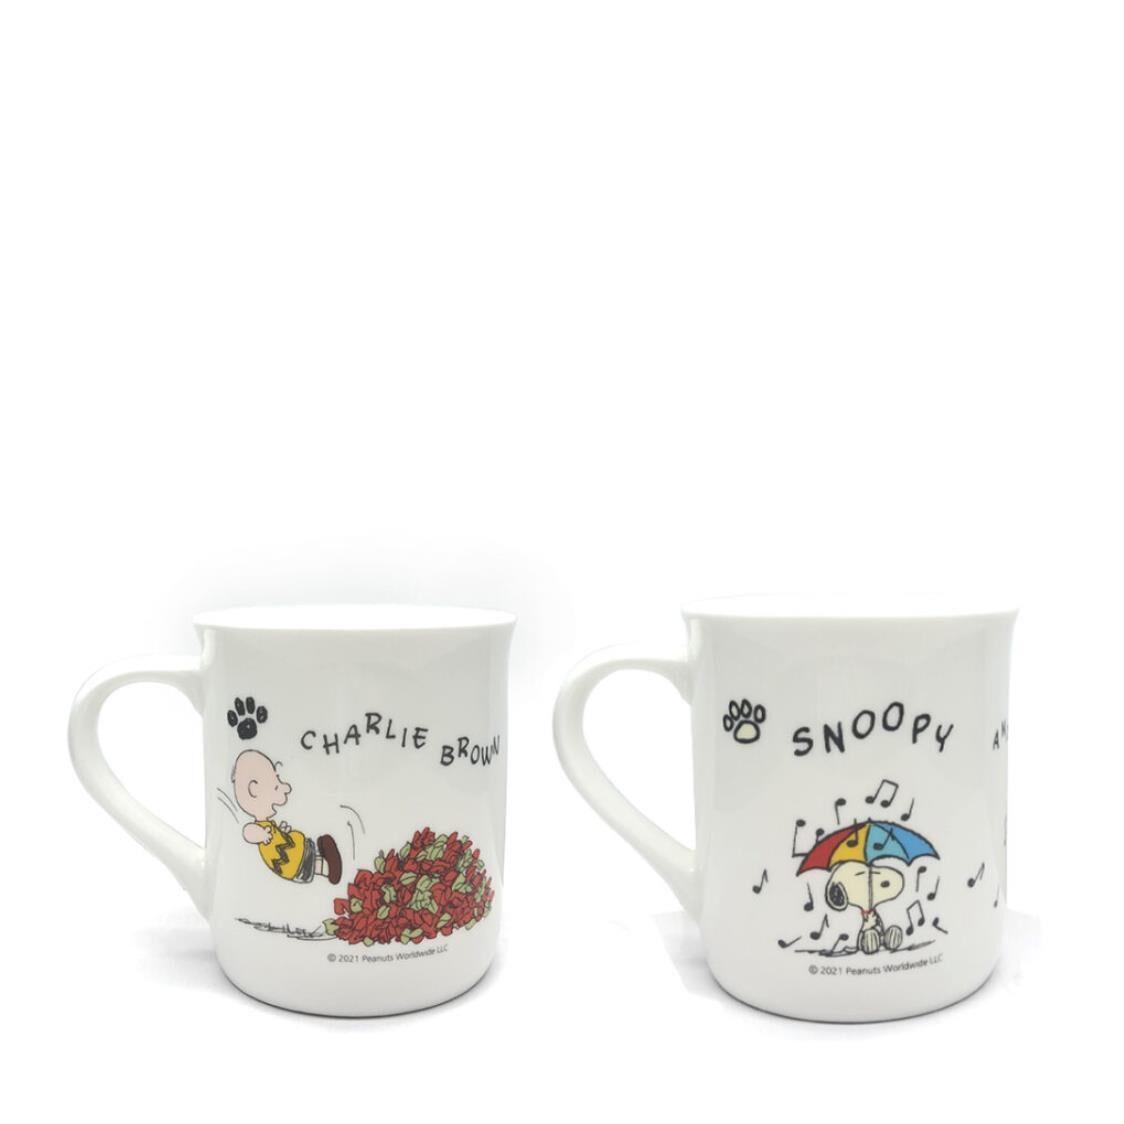 Corelle 2Pc Mug Set - Snoopy Re-Born